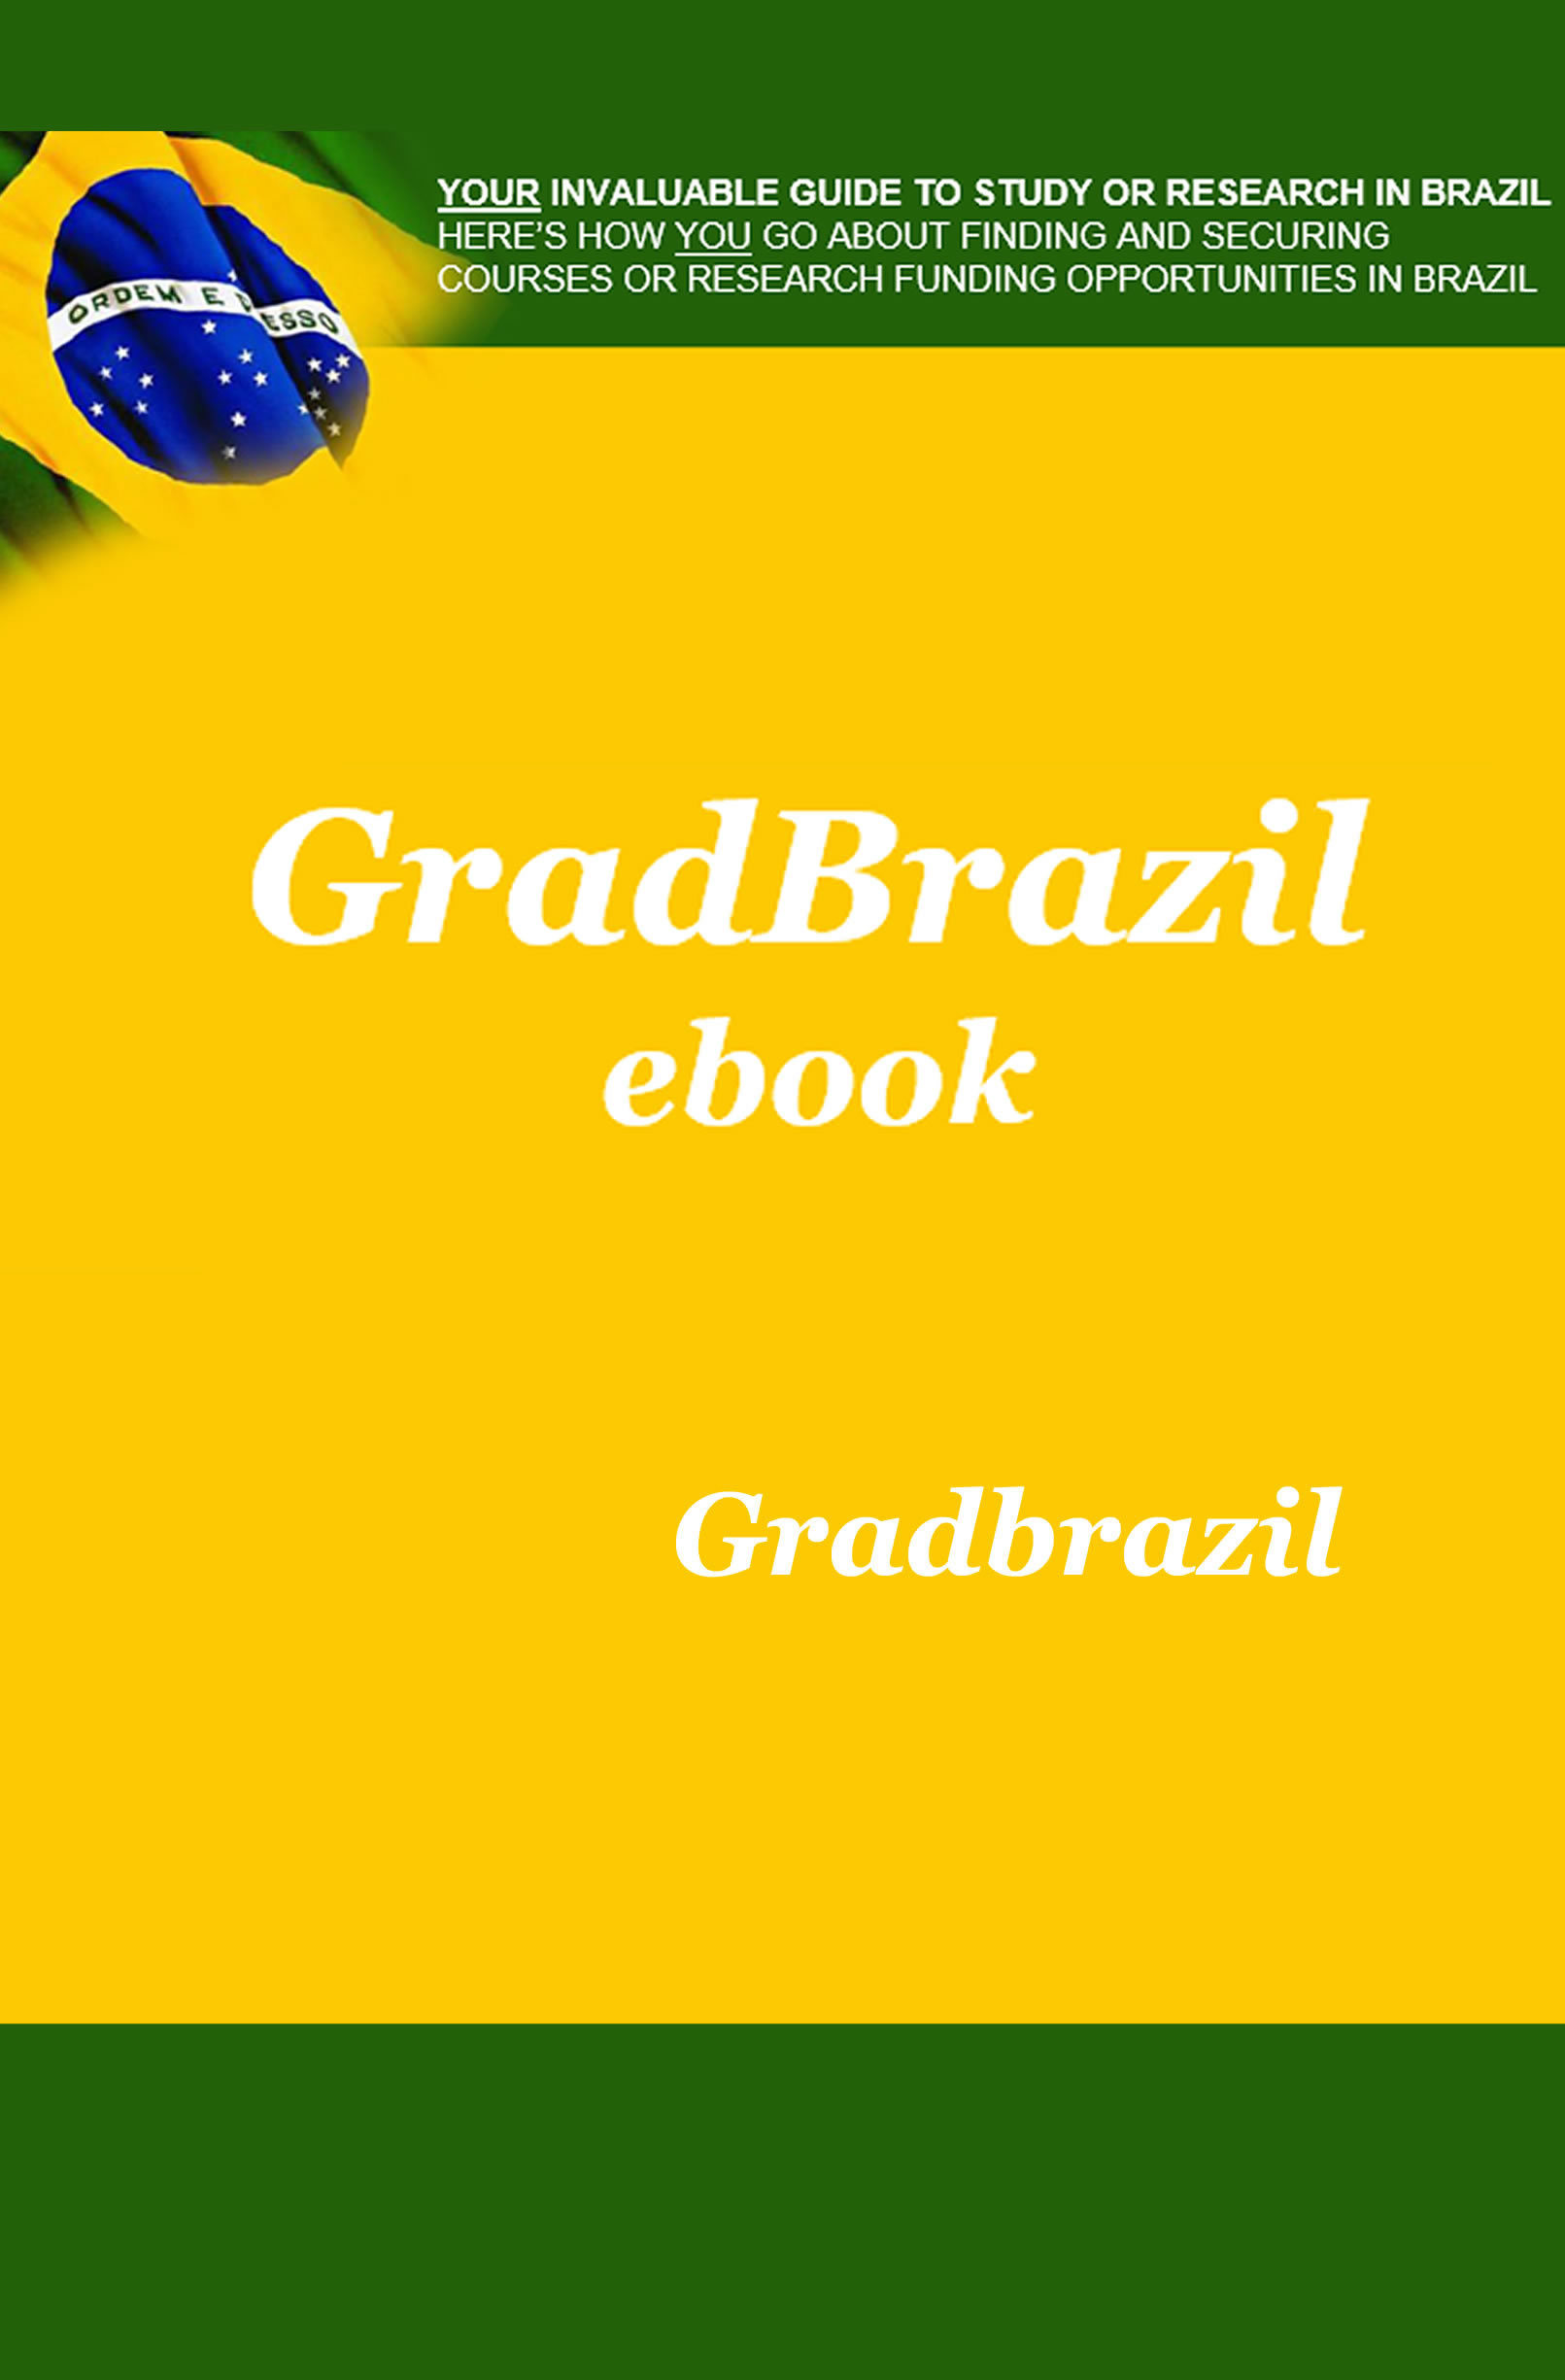 Grad Brazil eBook  by  GradBrazil